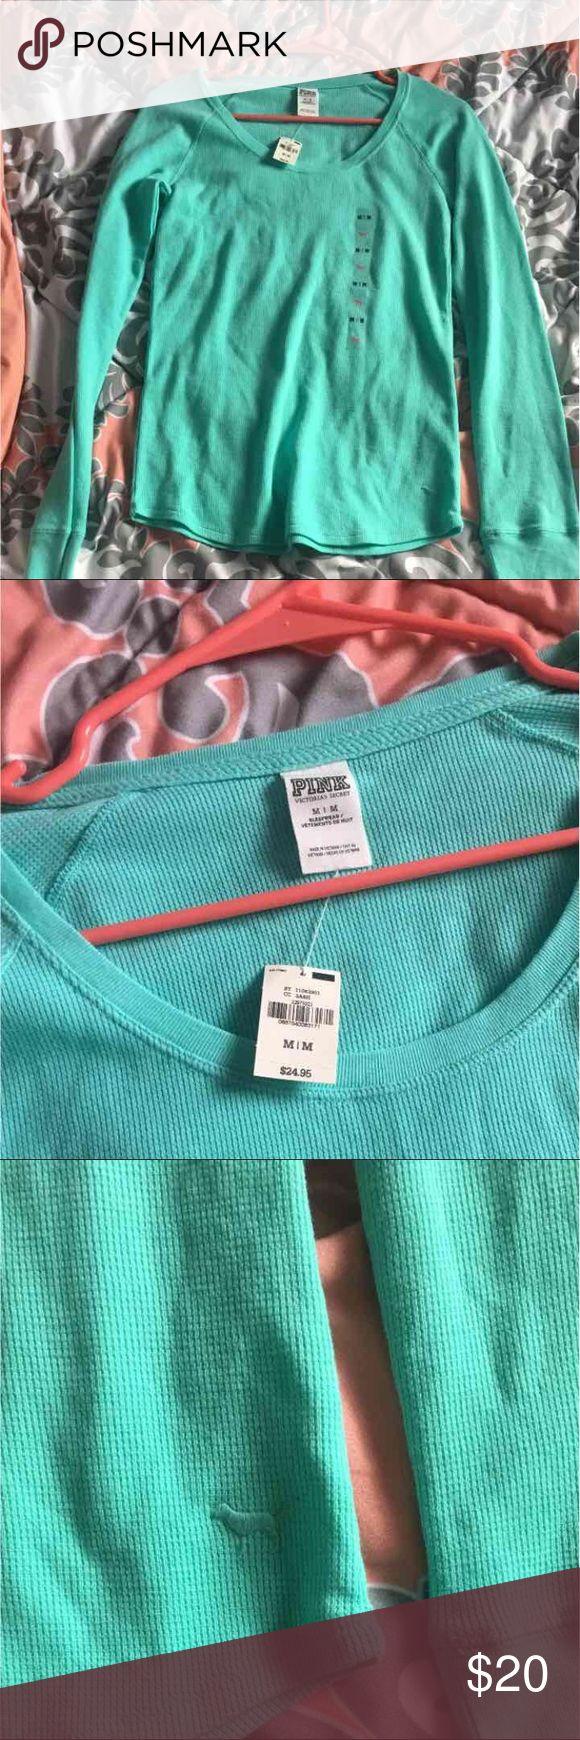 Victoria's Secret PINK long sleeve mint shirt NWT; never worn! Victoria's Secret PINK, size medium, long sleeve mint shirt. Same day or next day shipping! PINK Tops Tees - Long Sleeve